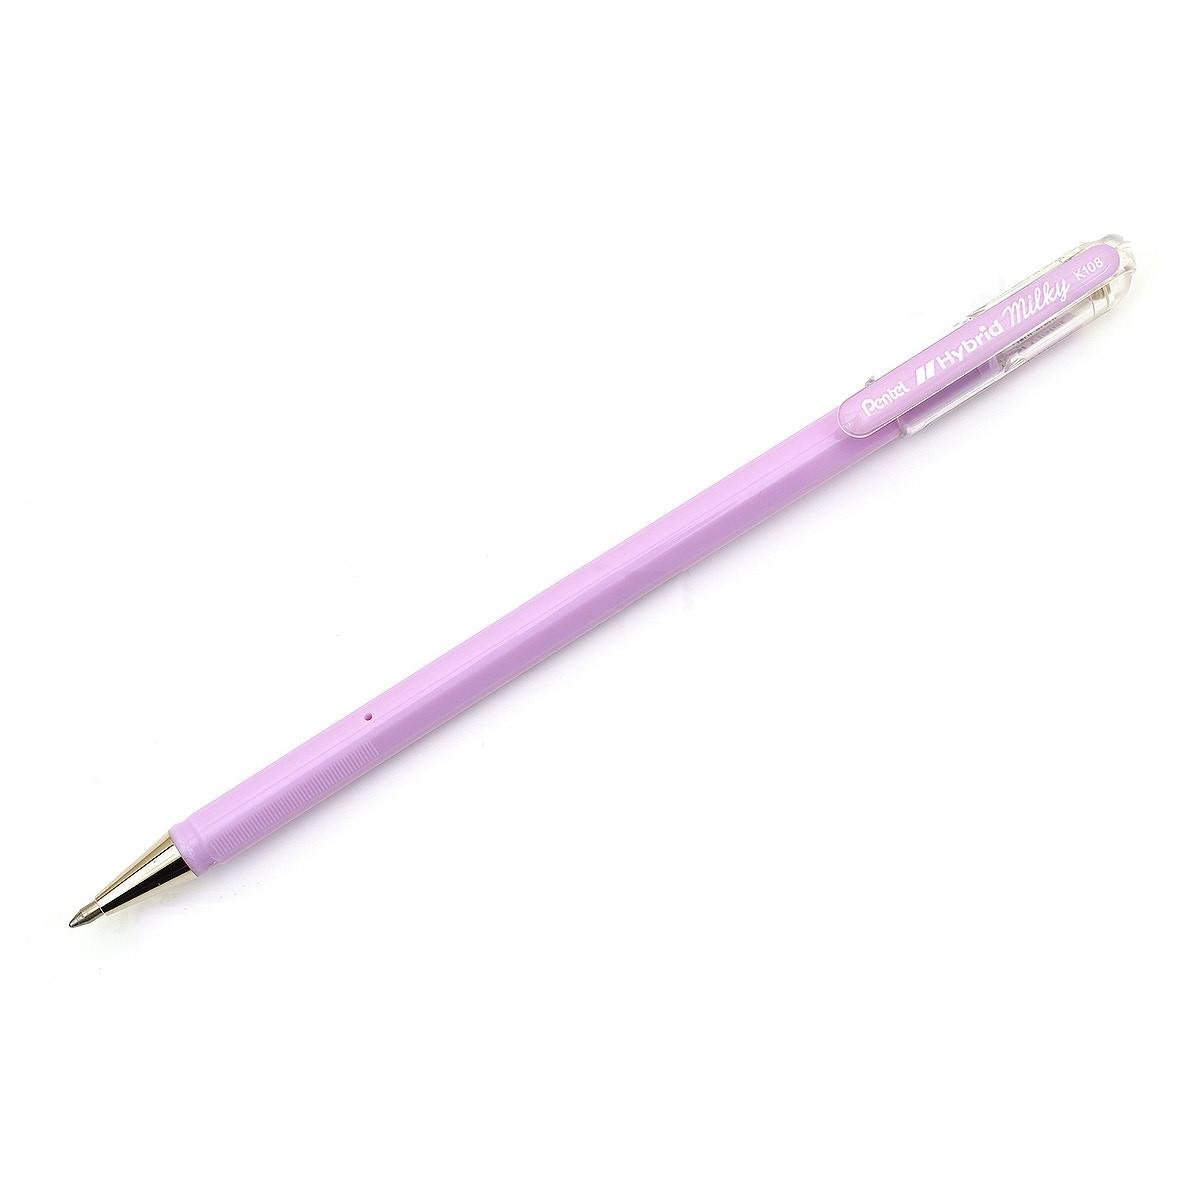 Bút Gel Sữa Dạ Quang Pentel Hybird Milky - 0.8mm - Màu tím pastel (Pastel Violet)